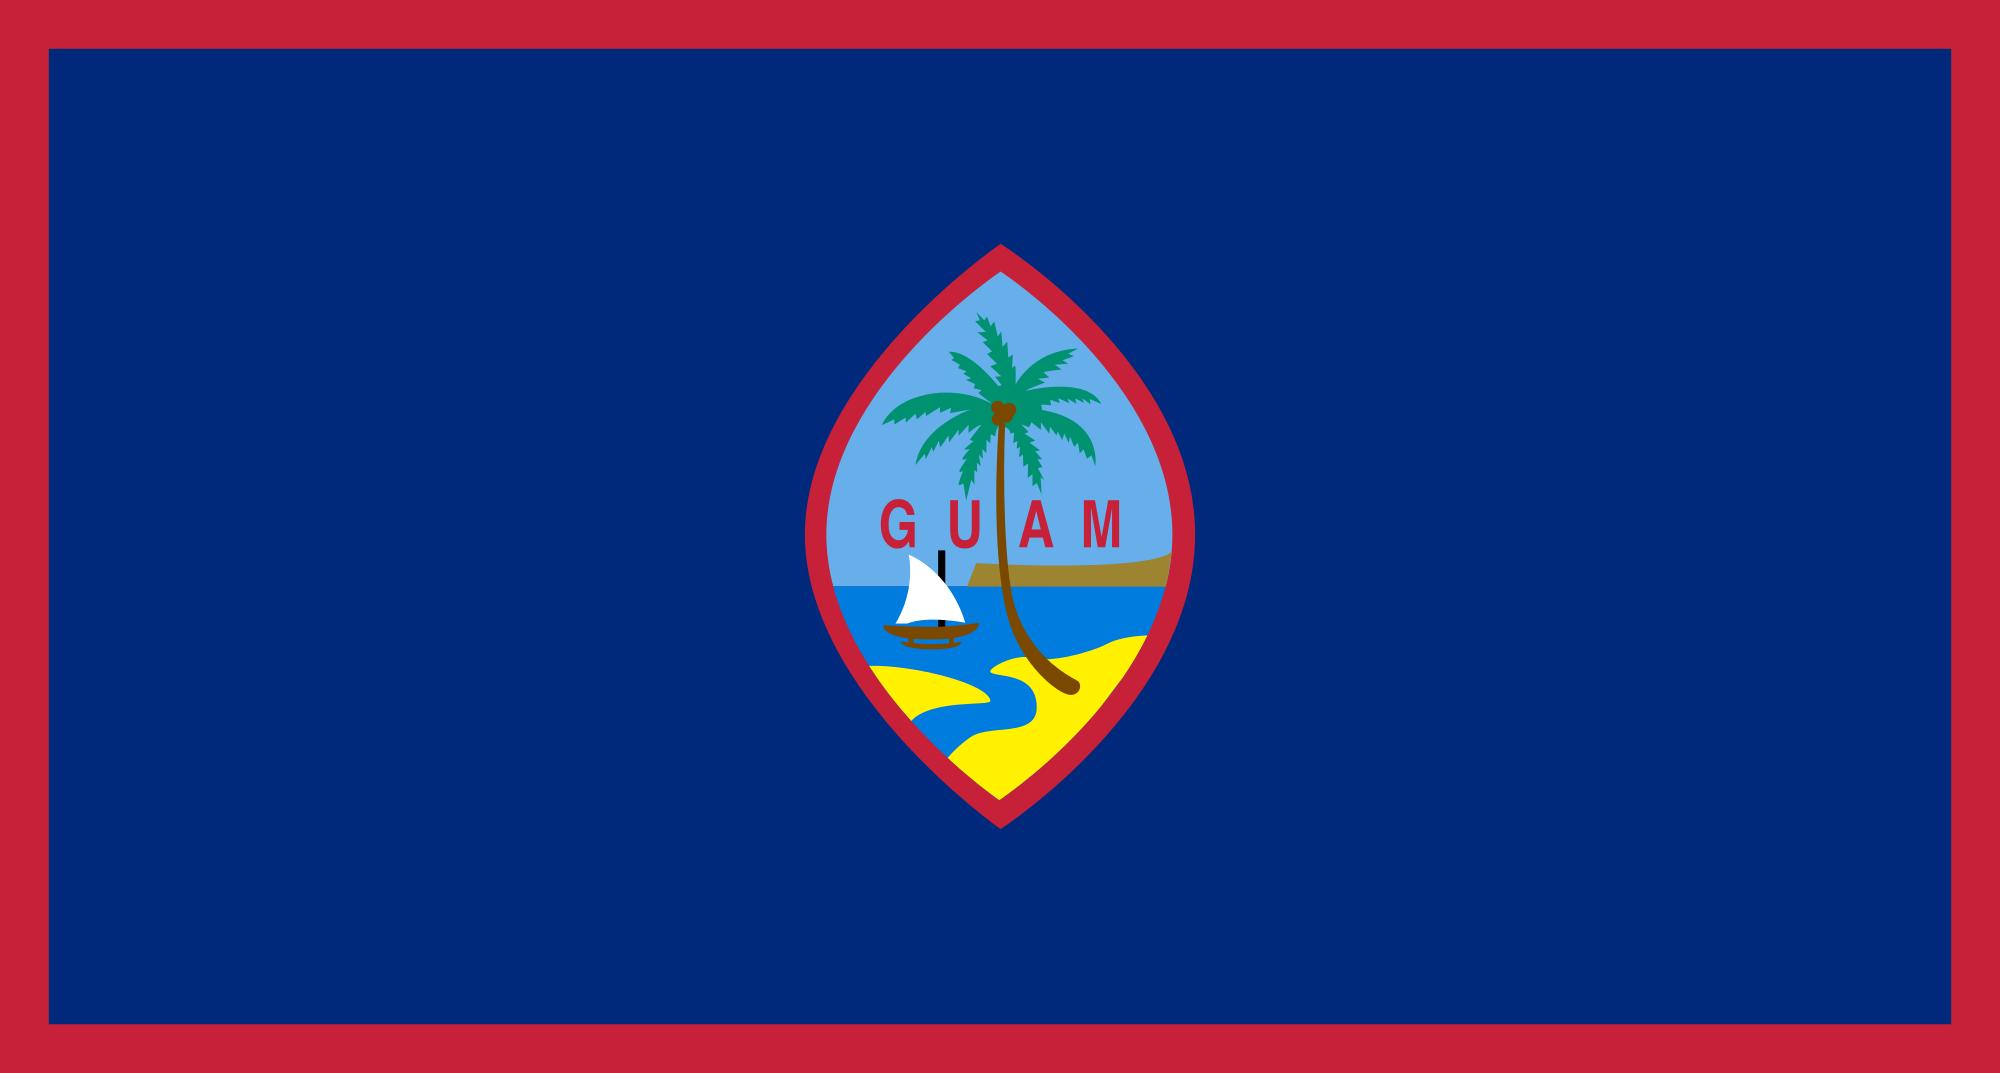 guam, paese, emblema, logo, simbolo - Sfondi HD - Professor-falken.com